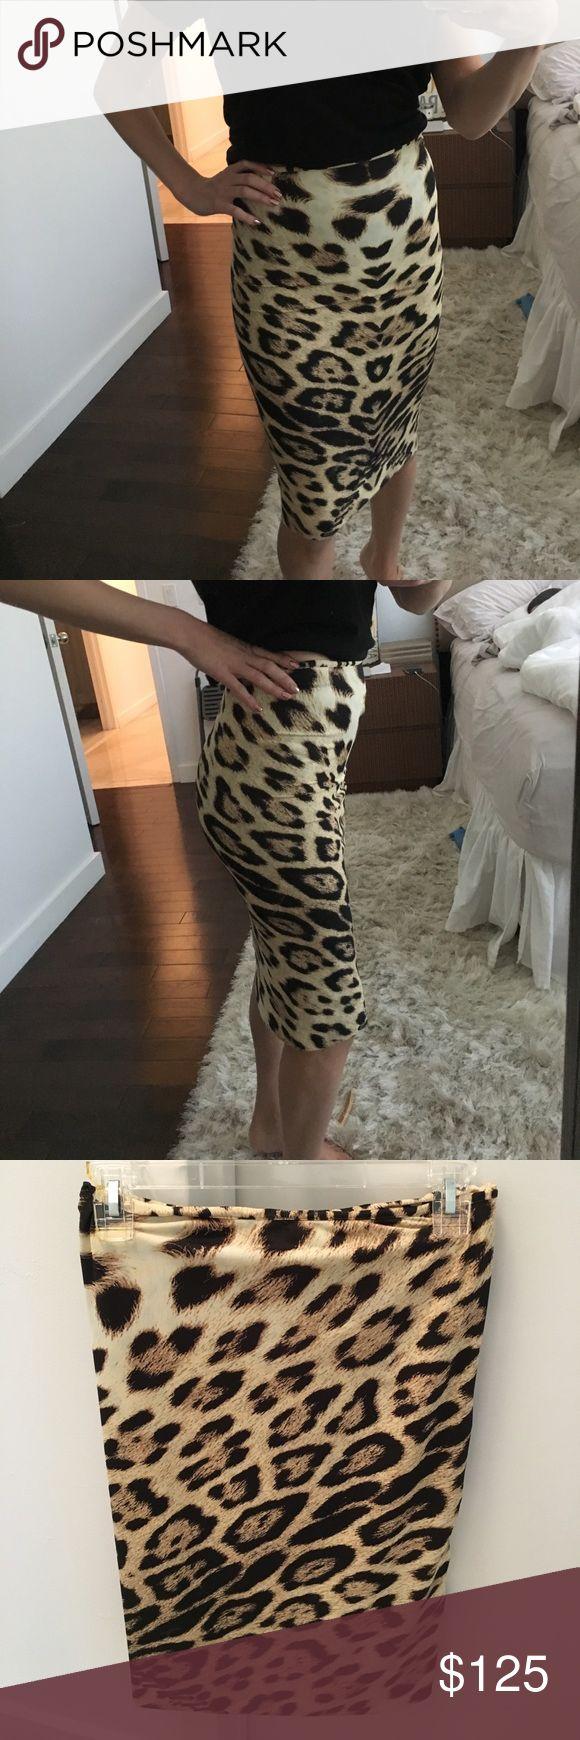 Roberto Cavalli Cheetah Skirt Roberto Cavalli Cheetah Print Skirt. So flattering and so nice. Size 38 = size 2 U.S.  perfect condition. So stretchy and comfortable Roberto Cavalli Skirts Pencil